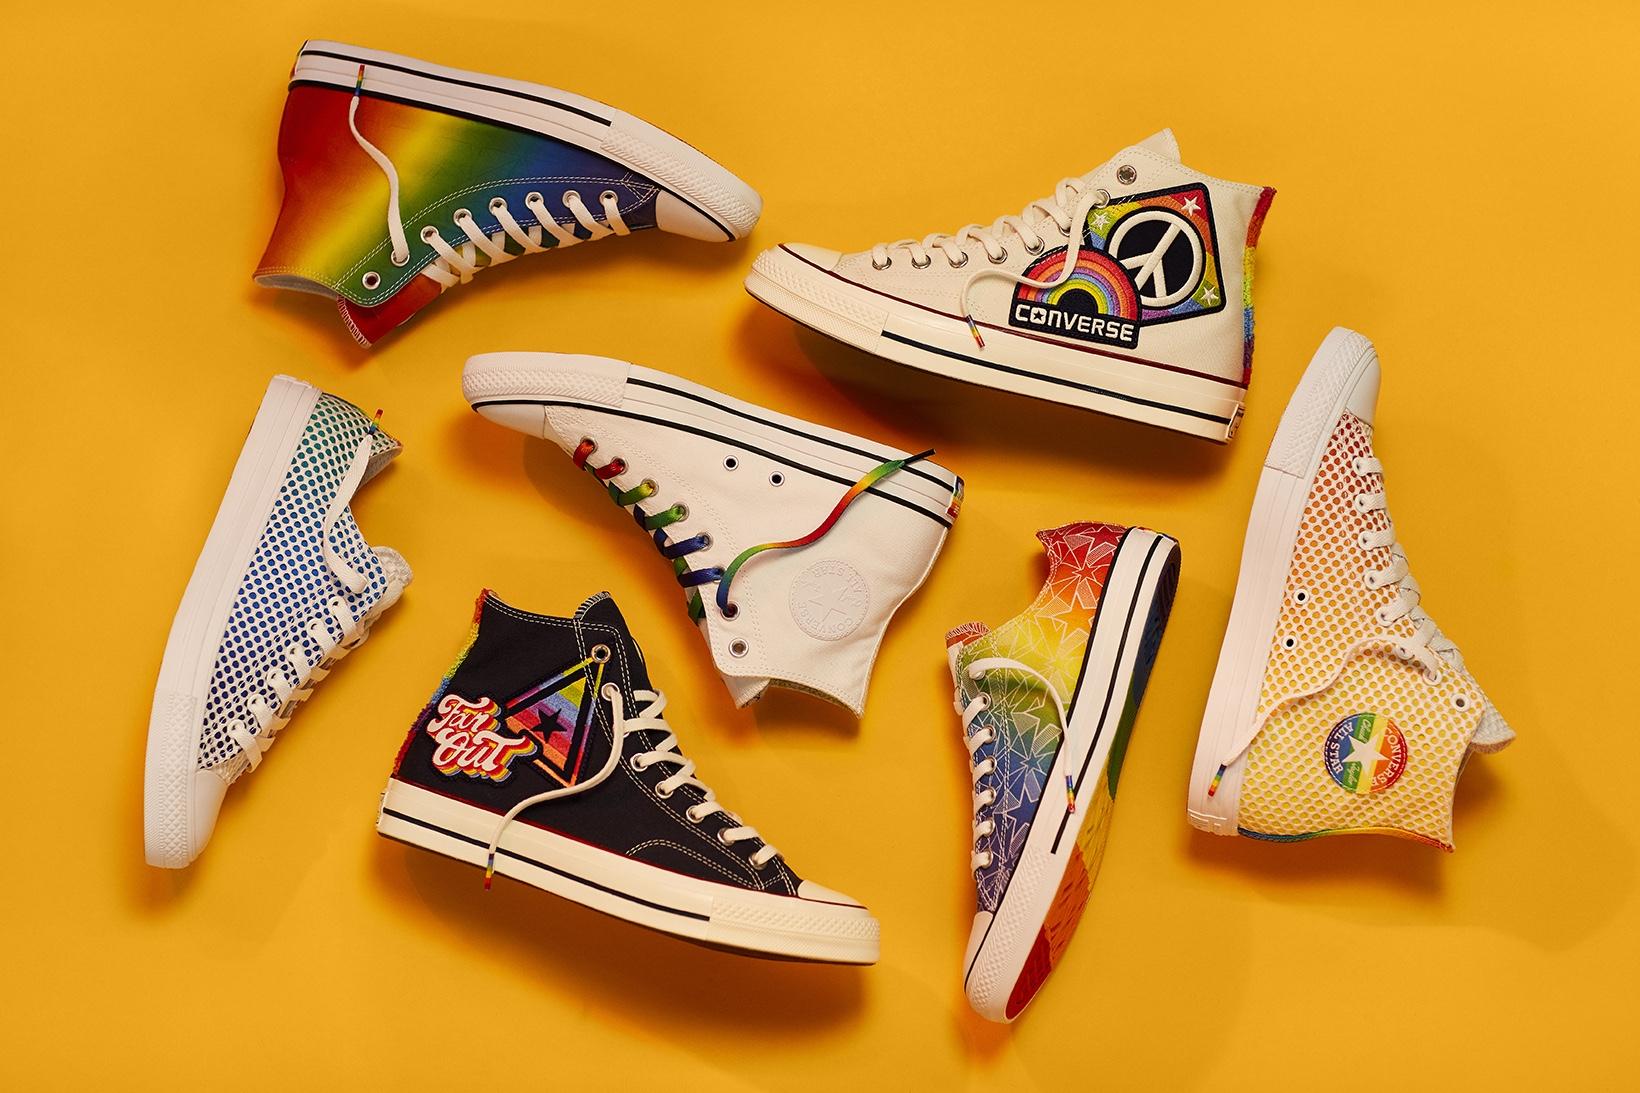 Shop Miley Cyrus Pride Collection With